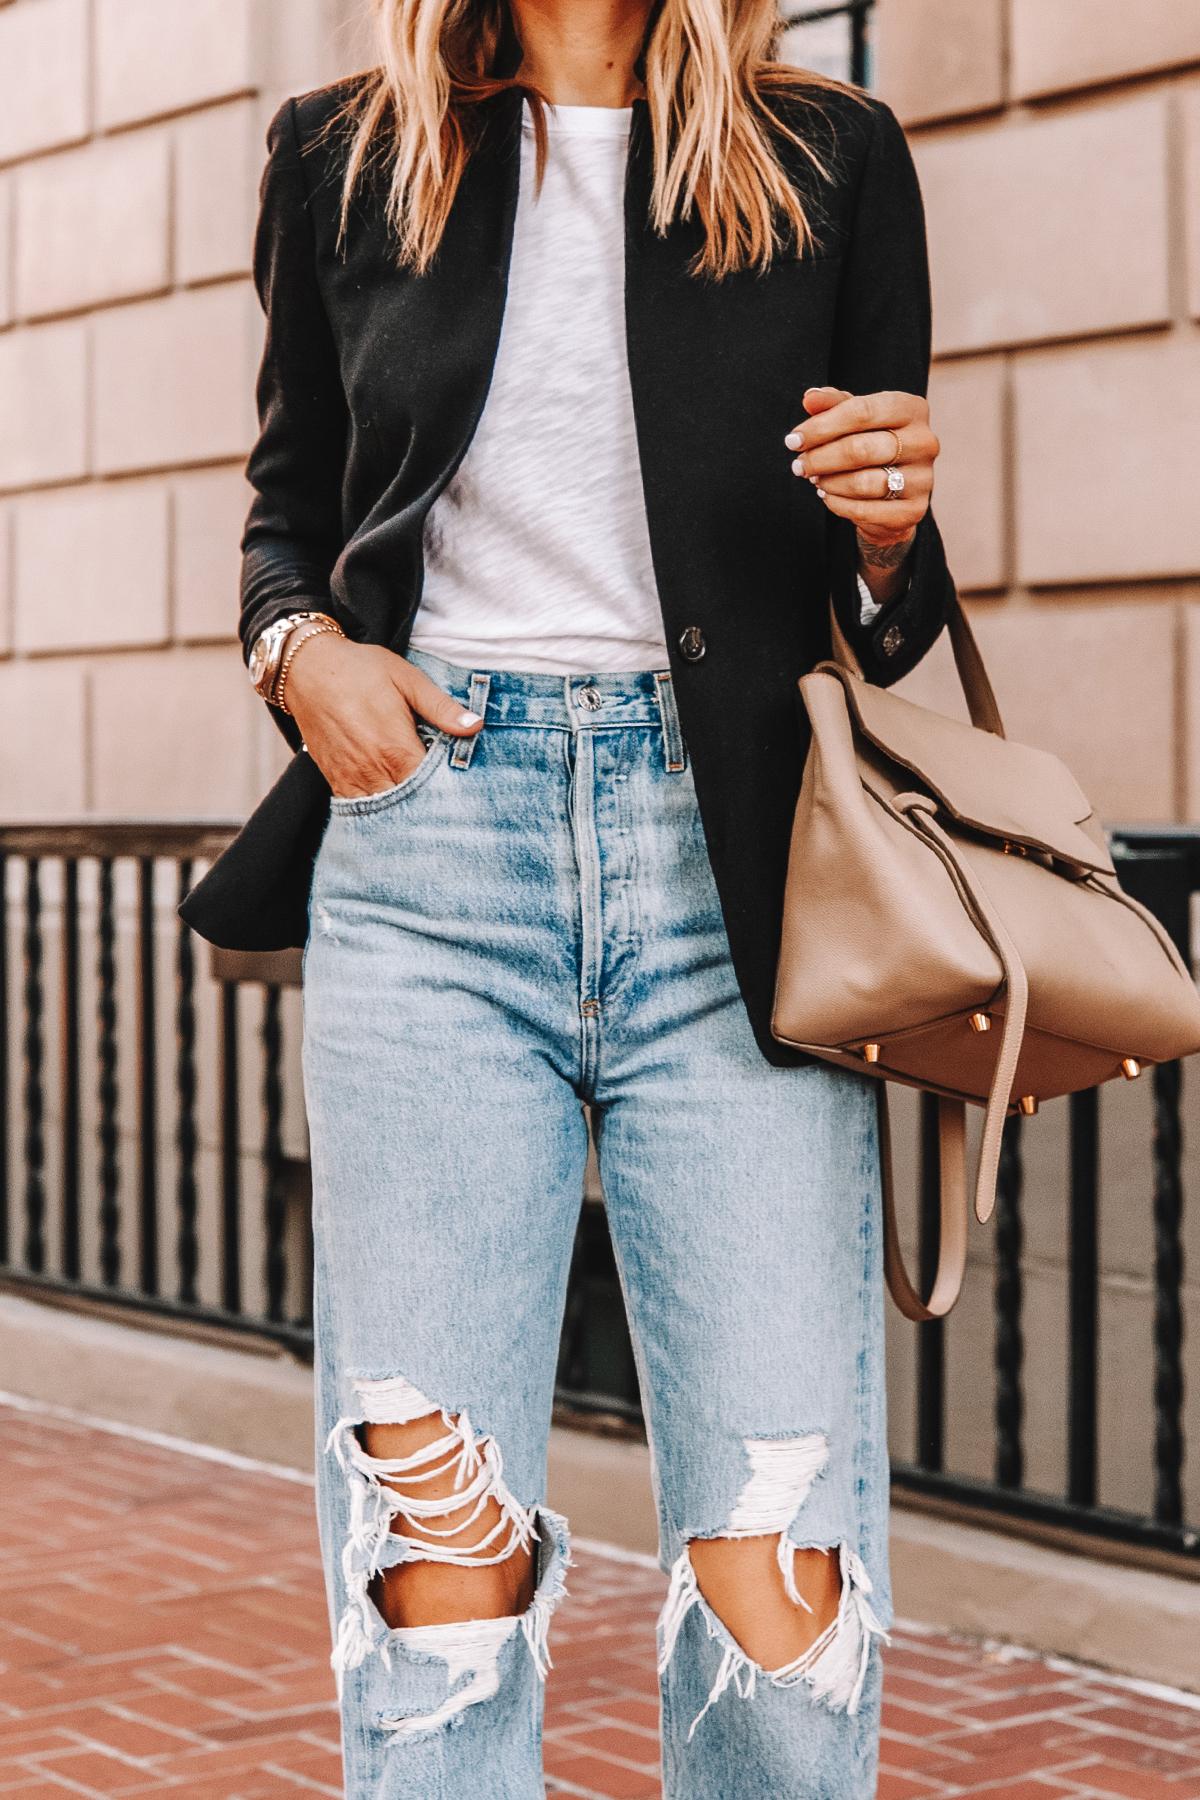 Fashion Jackson Wearing Jcrew Regent Black Blazer ATM White Tshirt AGOLDE Ripped Jeans Celine Belt Bag 1